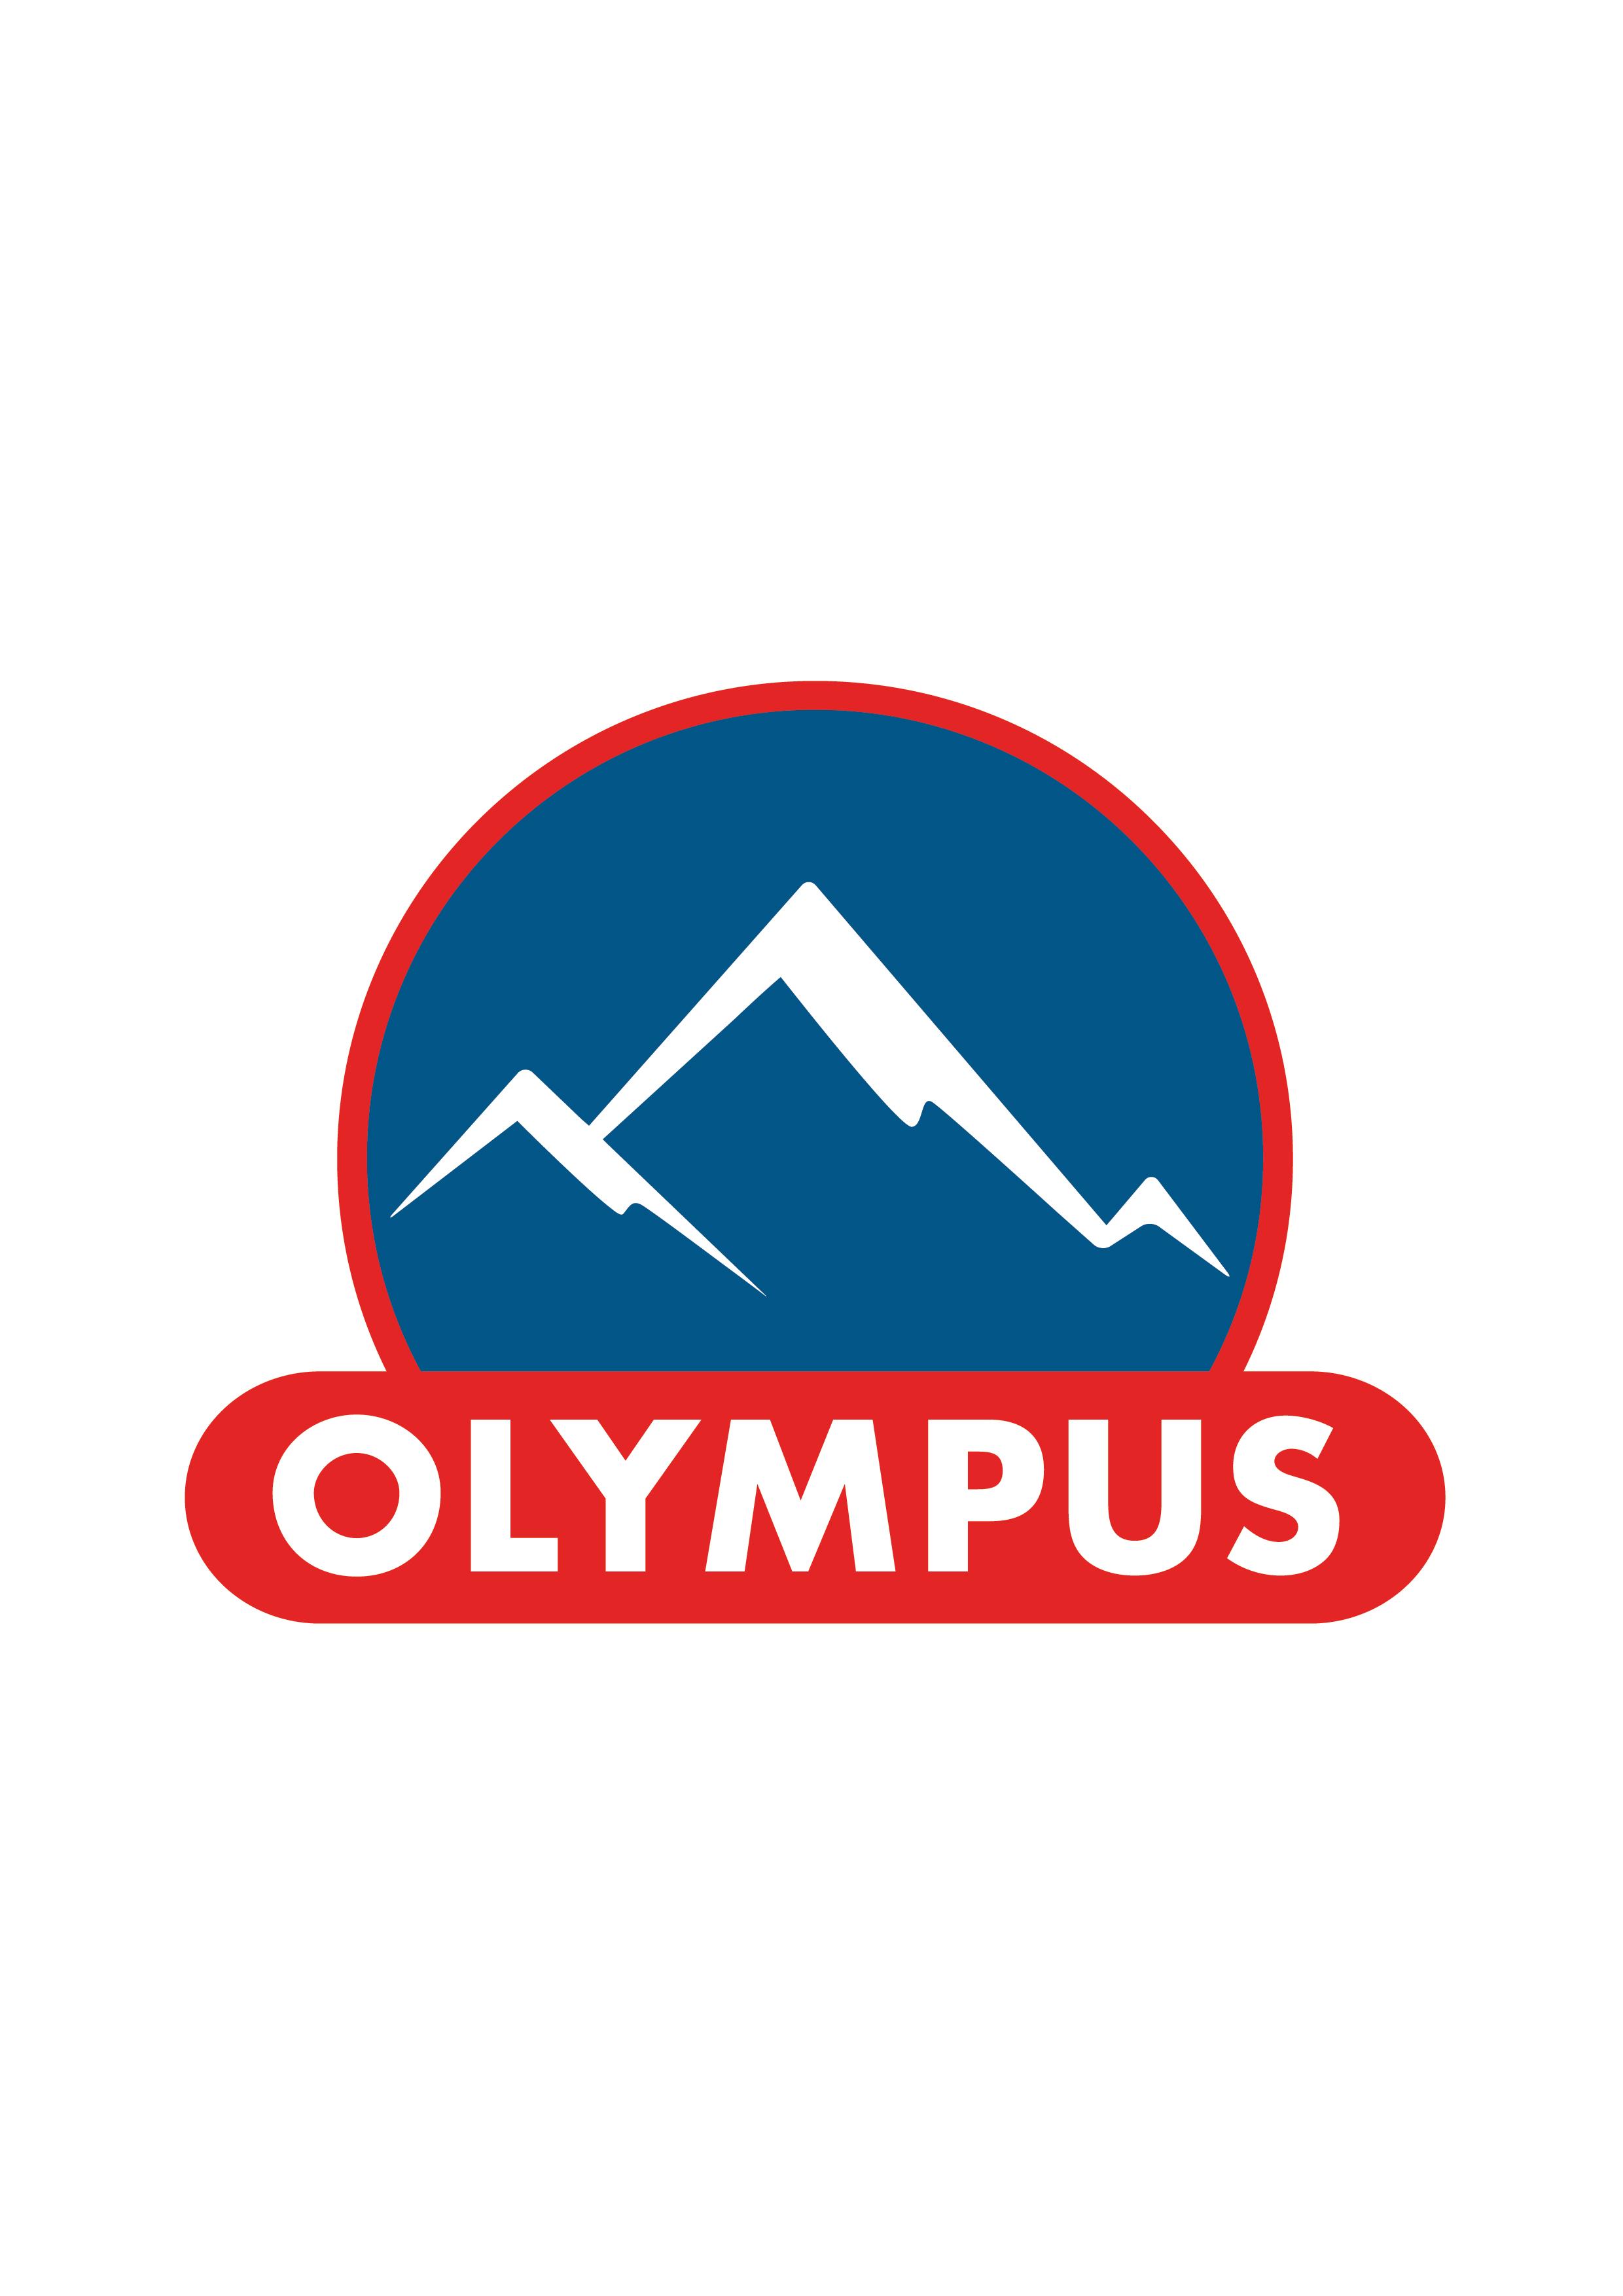 Olympus foods doo Beograd